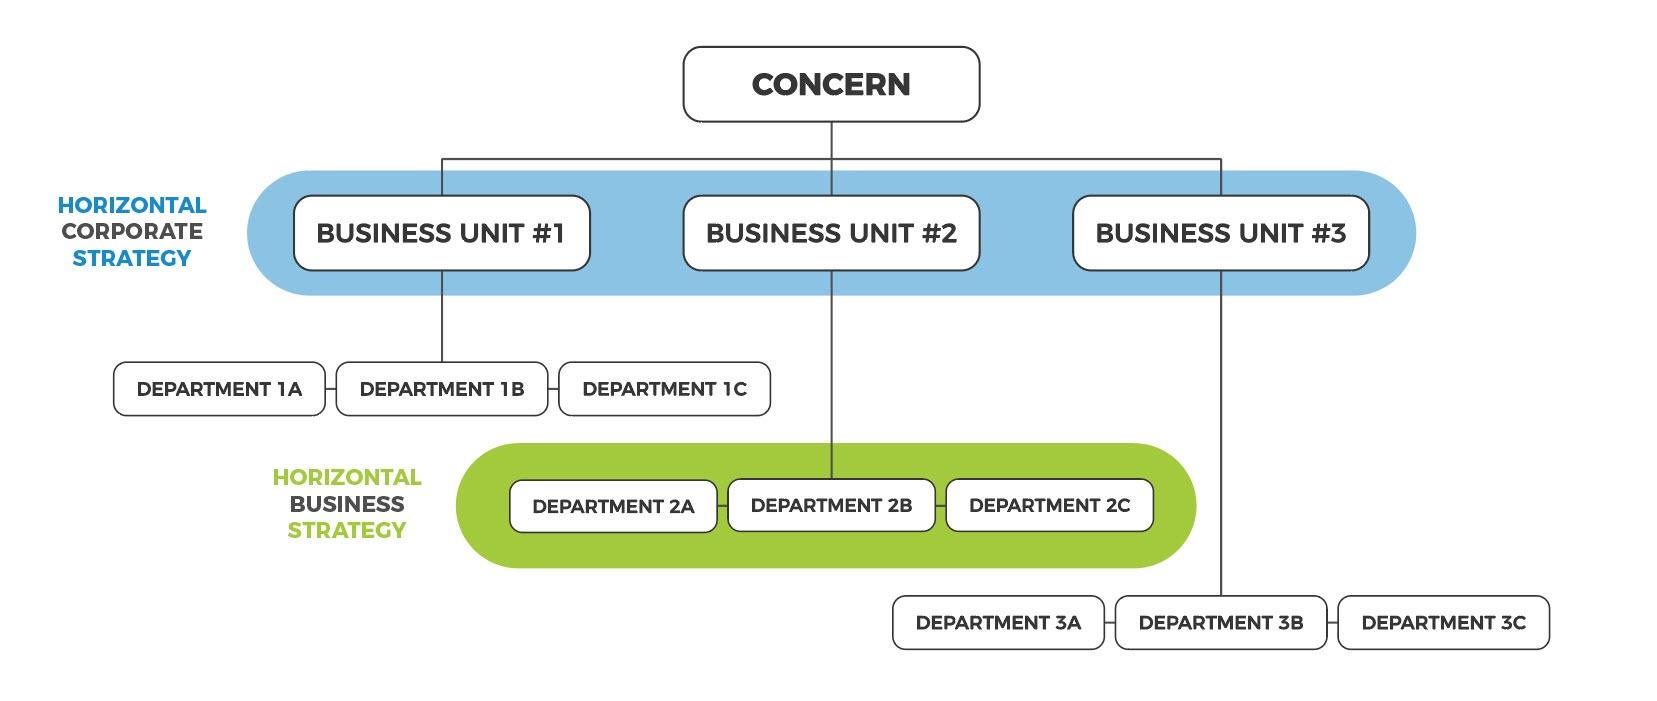 ROUNDMAP-Horizontal-Strategy